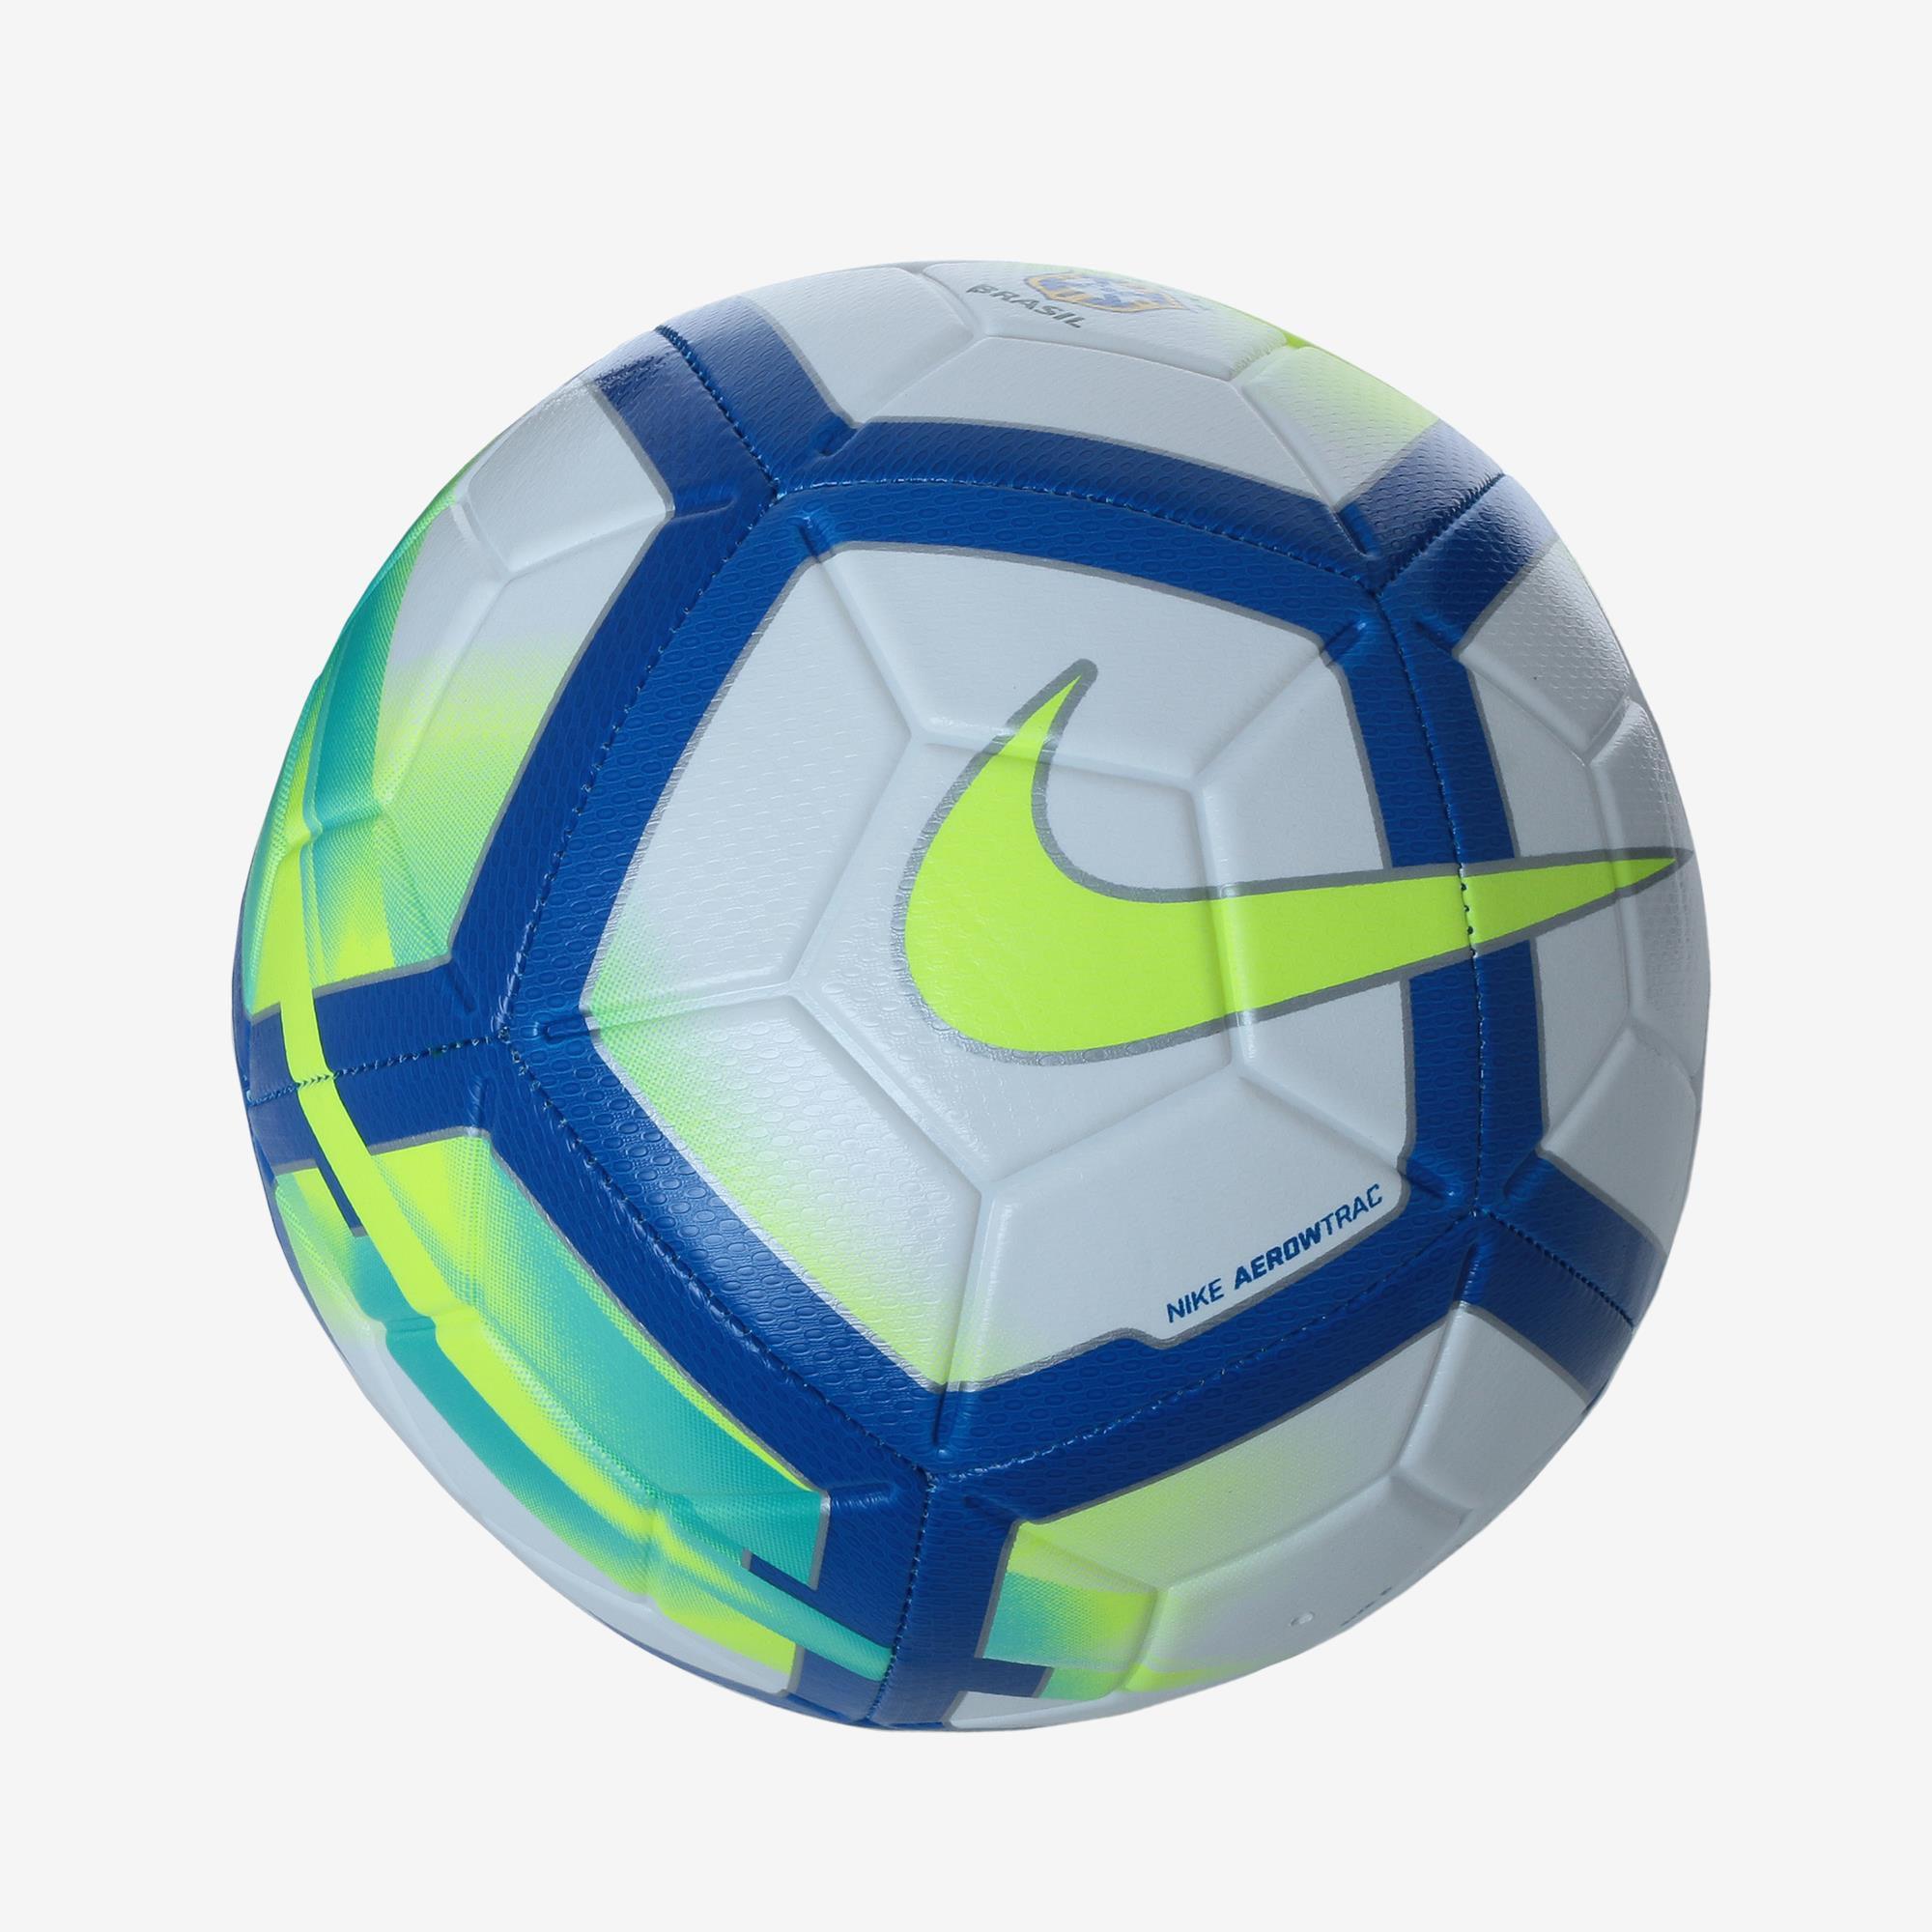 3b9b2f6ac Bola Futebol Nike Unissex Brasil CBF - BRACIA SHOP  Loja de Roupas ...